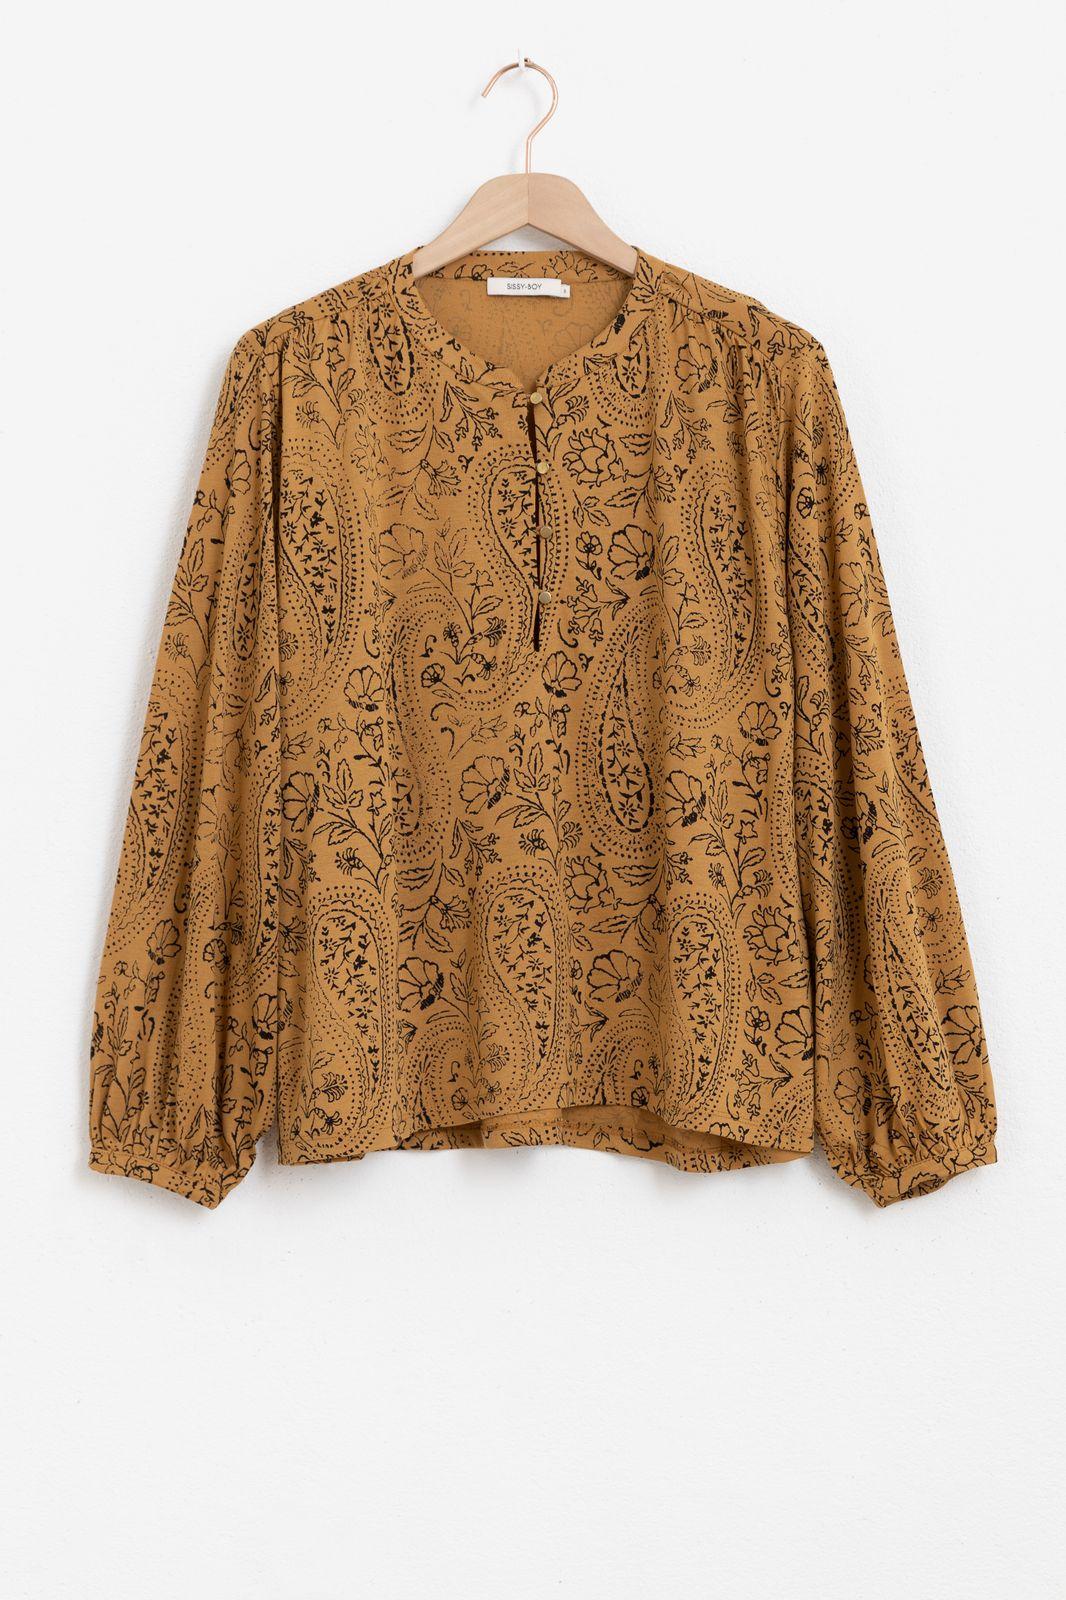 Bruine blouse met all over print